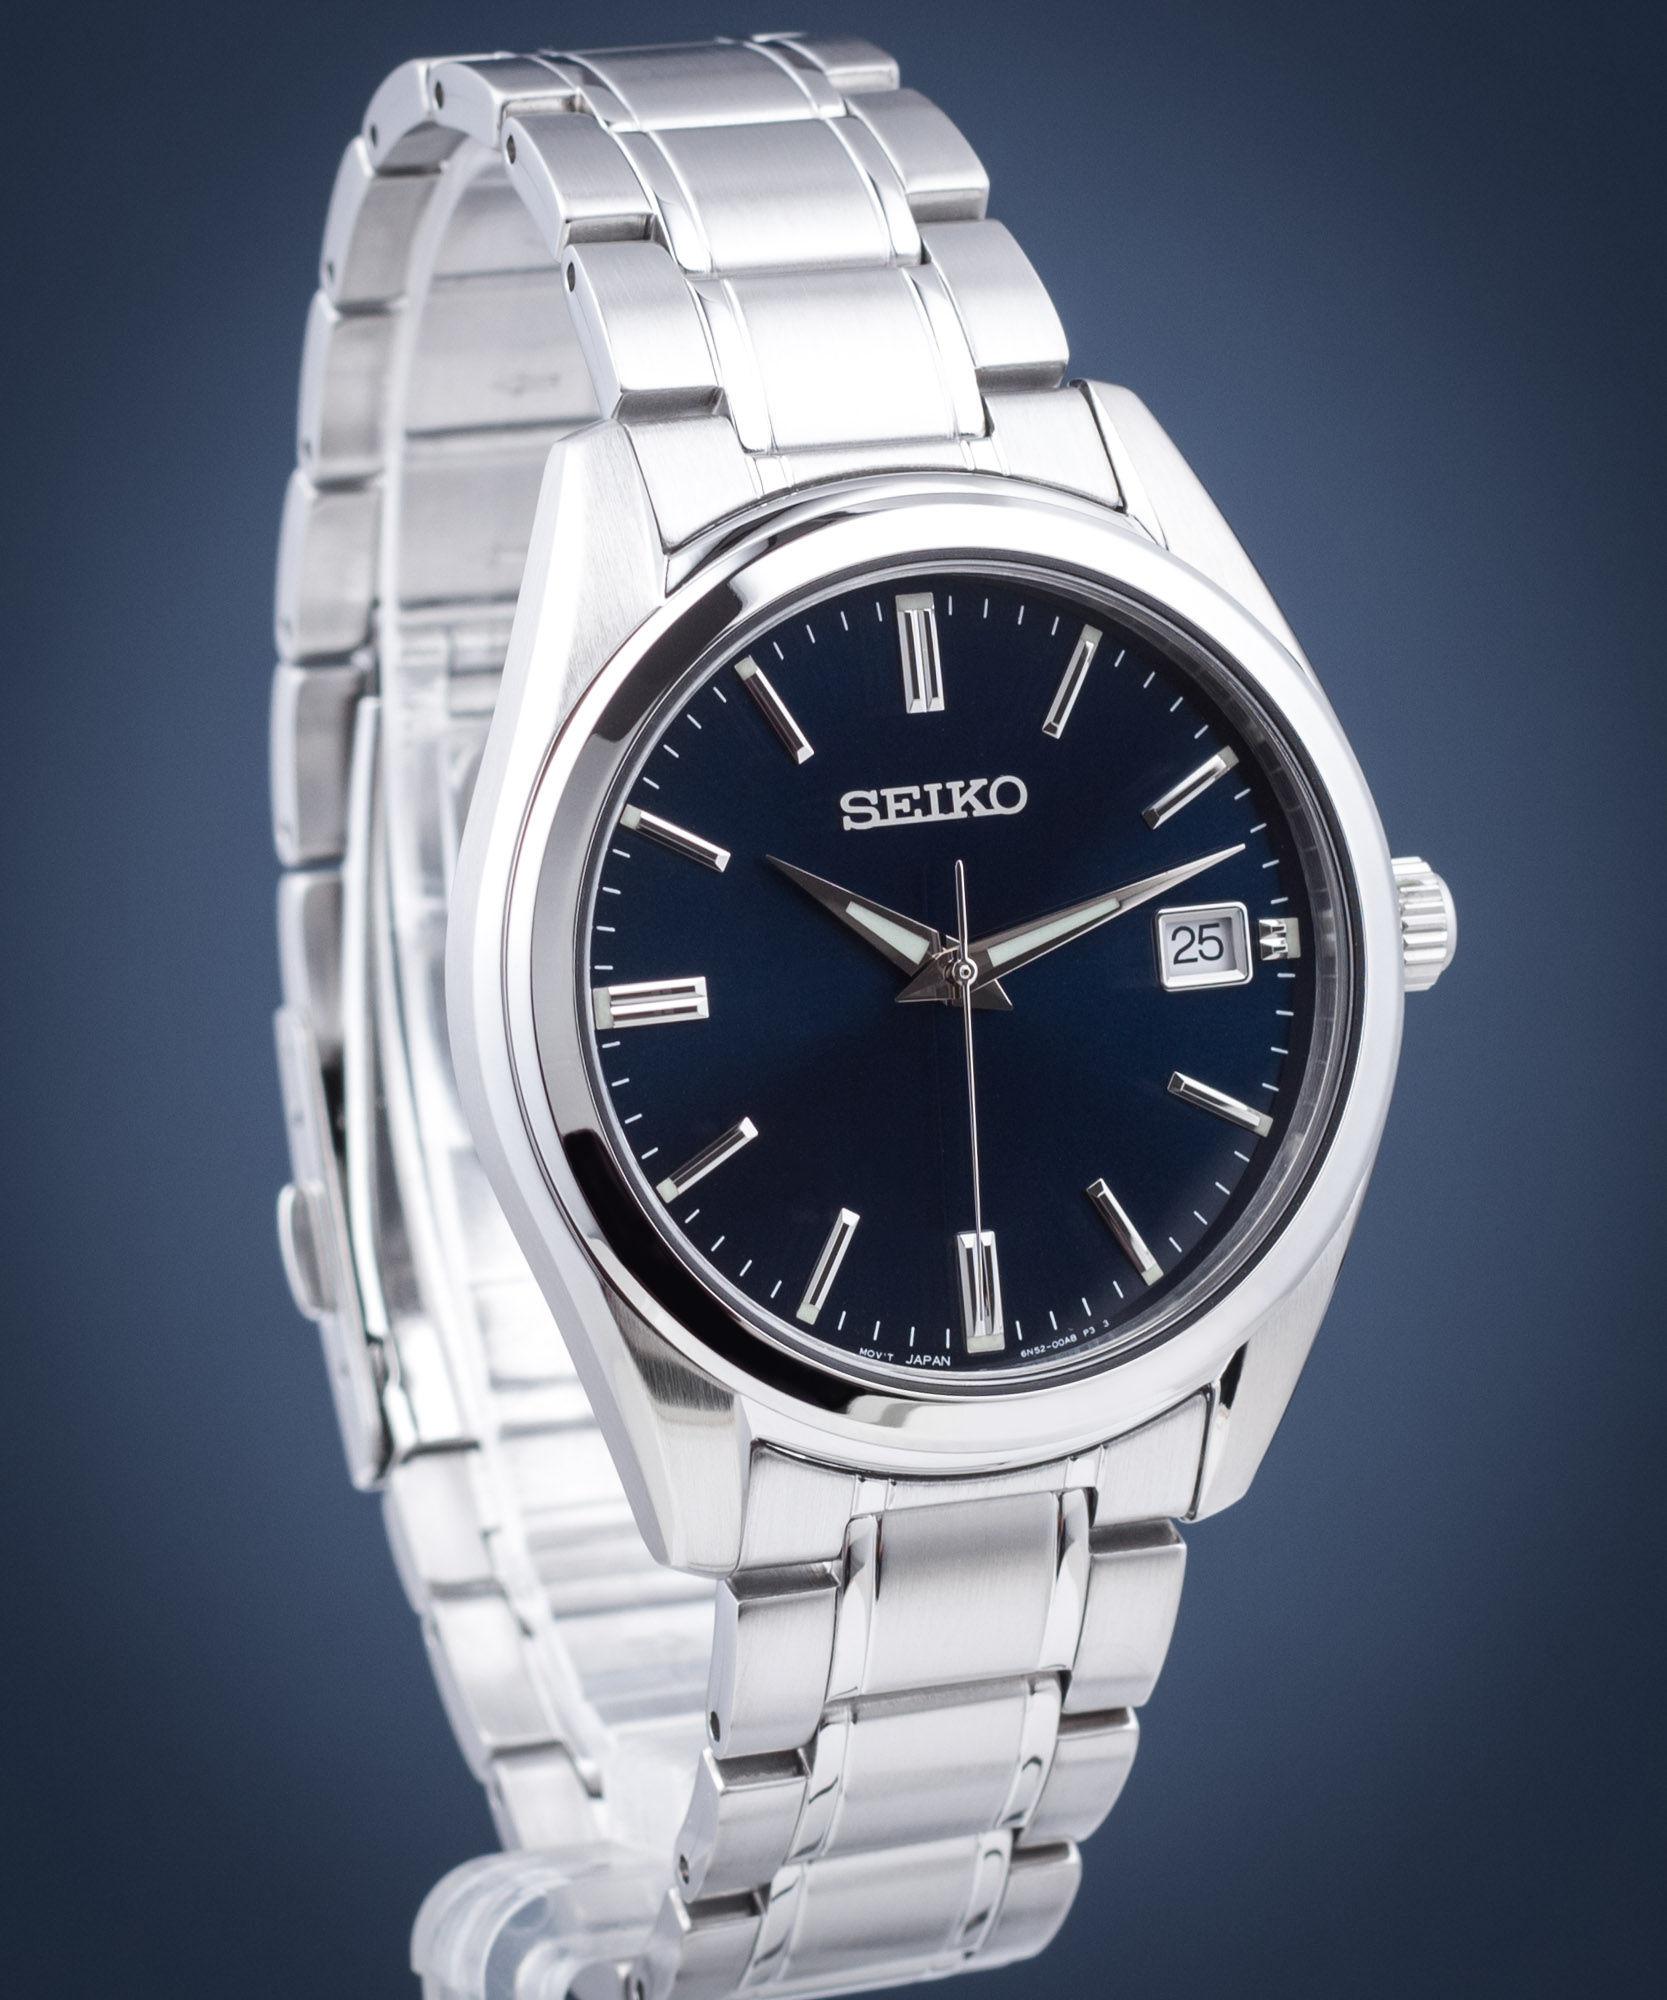 Zegarek męski Seiko New Link